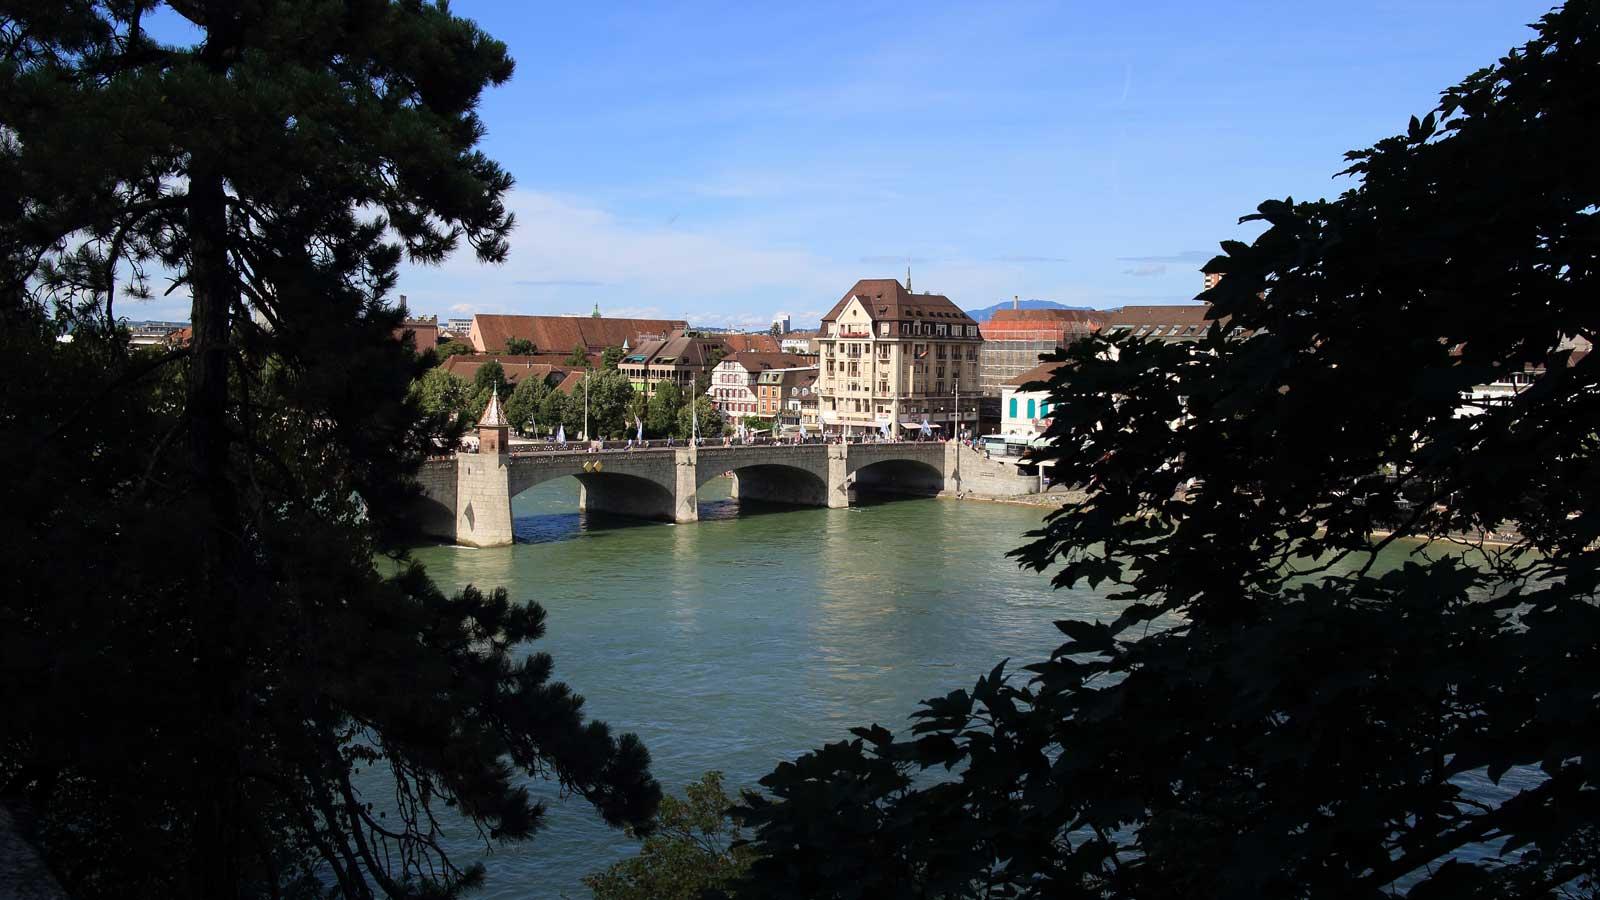 Rhine-09-08-14_17-59-42